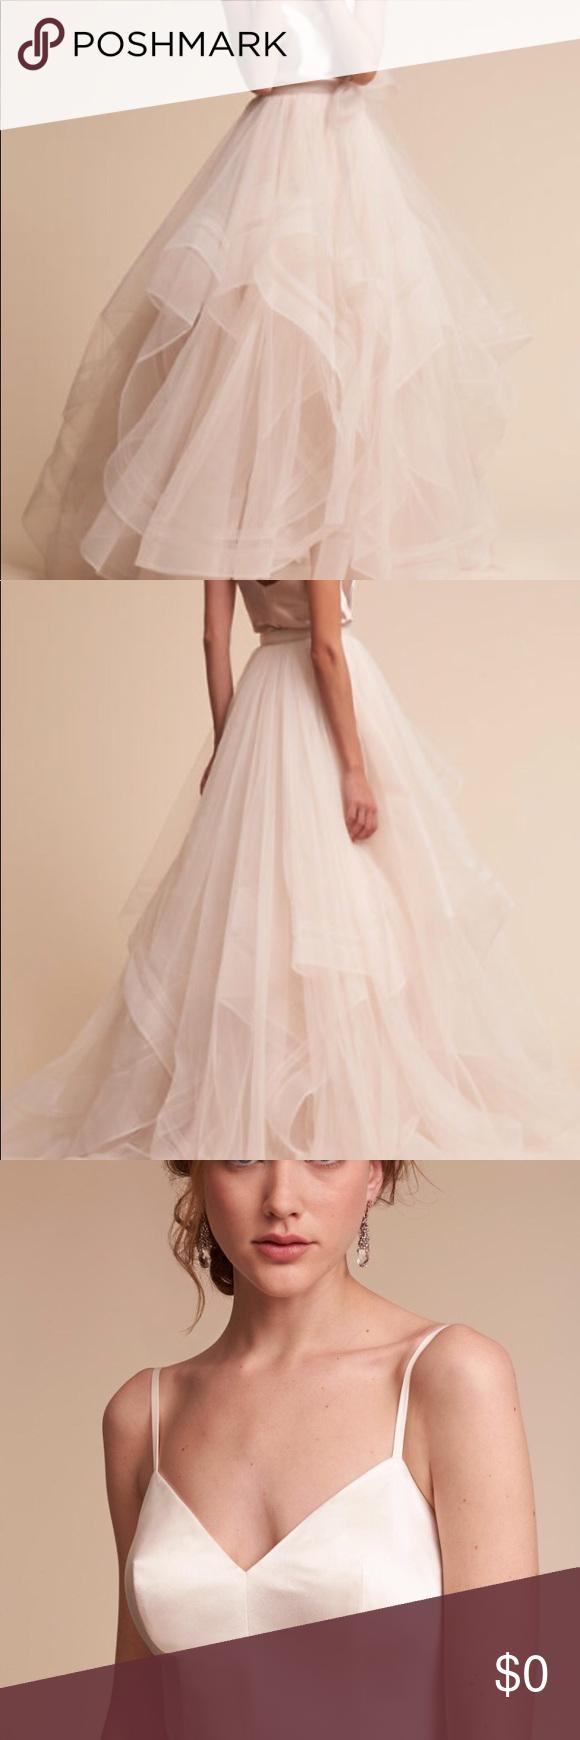 Wedding dress bodysuit  Effie skirt  wedding dress  Bodysuit and Jewel